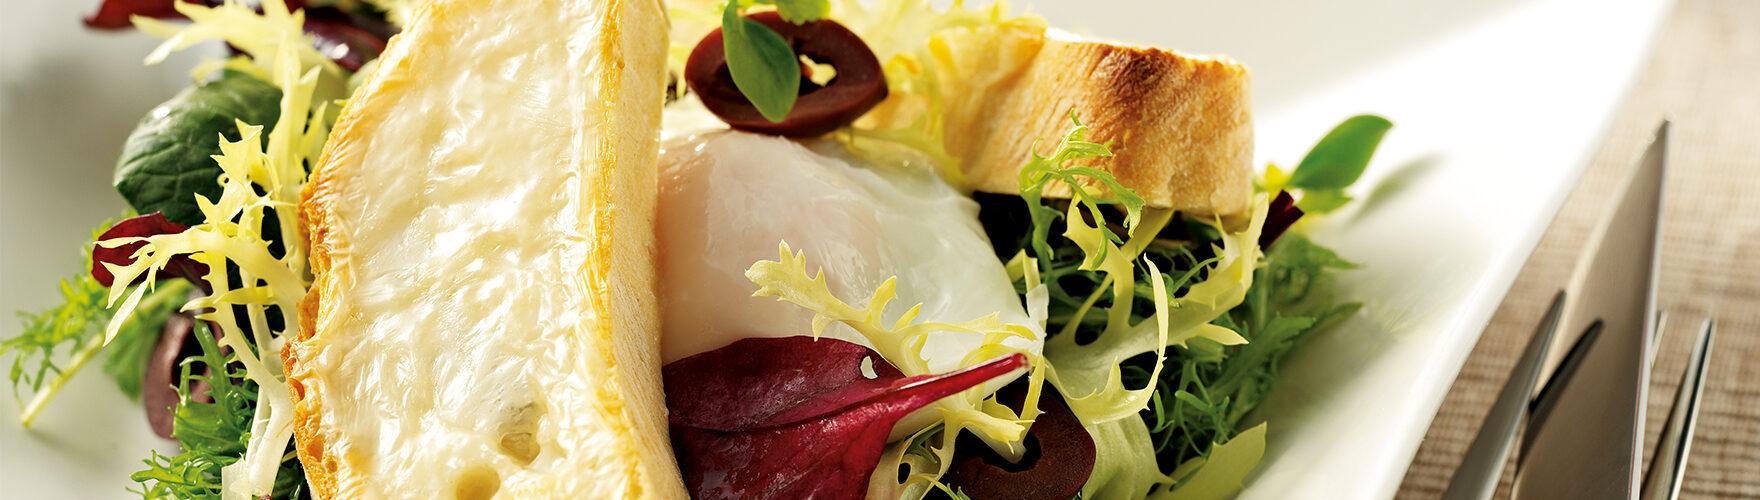 Frisse salade met geitenkaas crostini